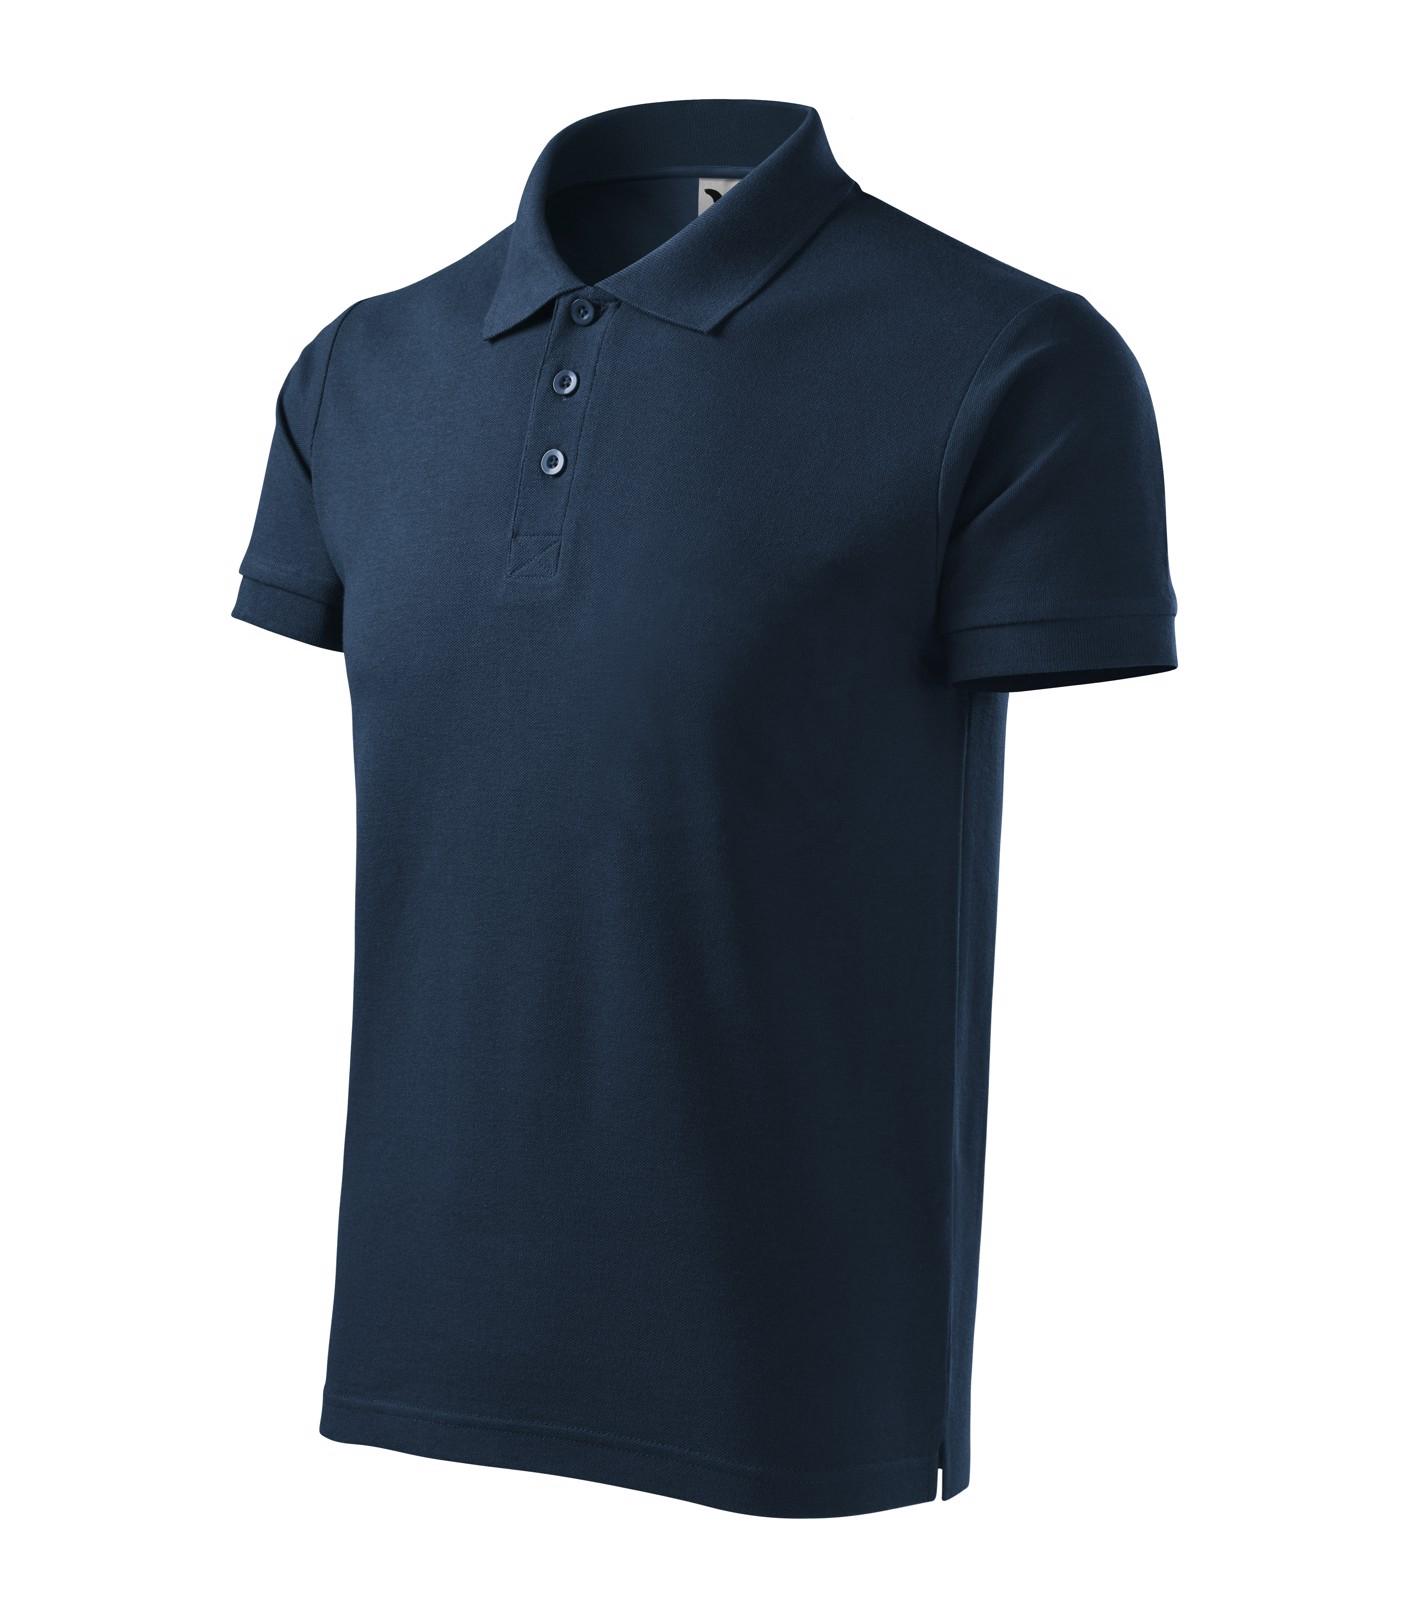 Polo Shirt Gents Malfini Cotton Heavy - Navy Blue / 2XL